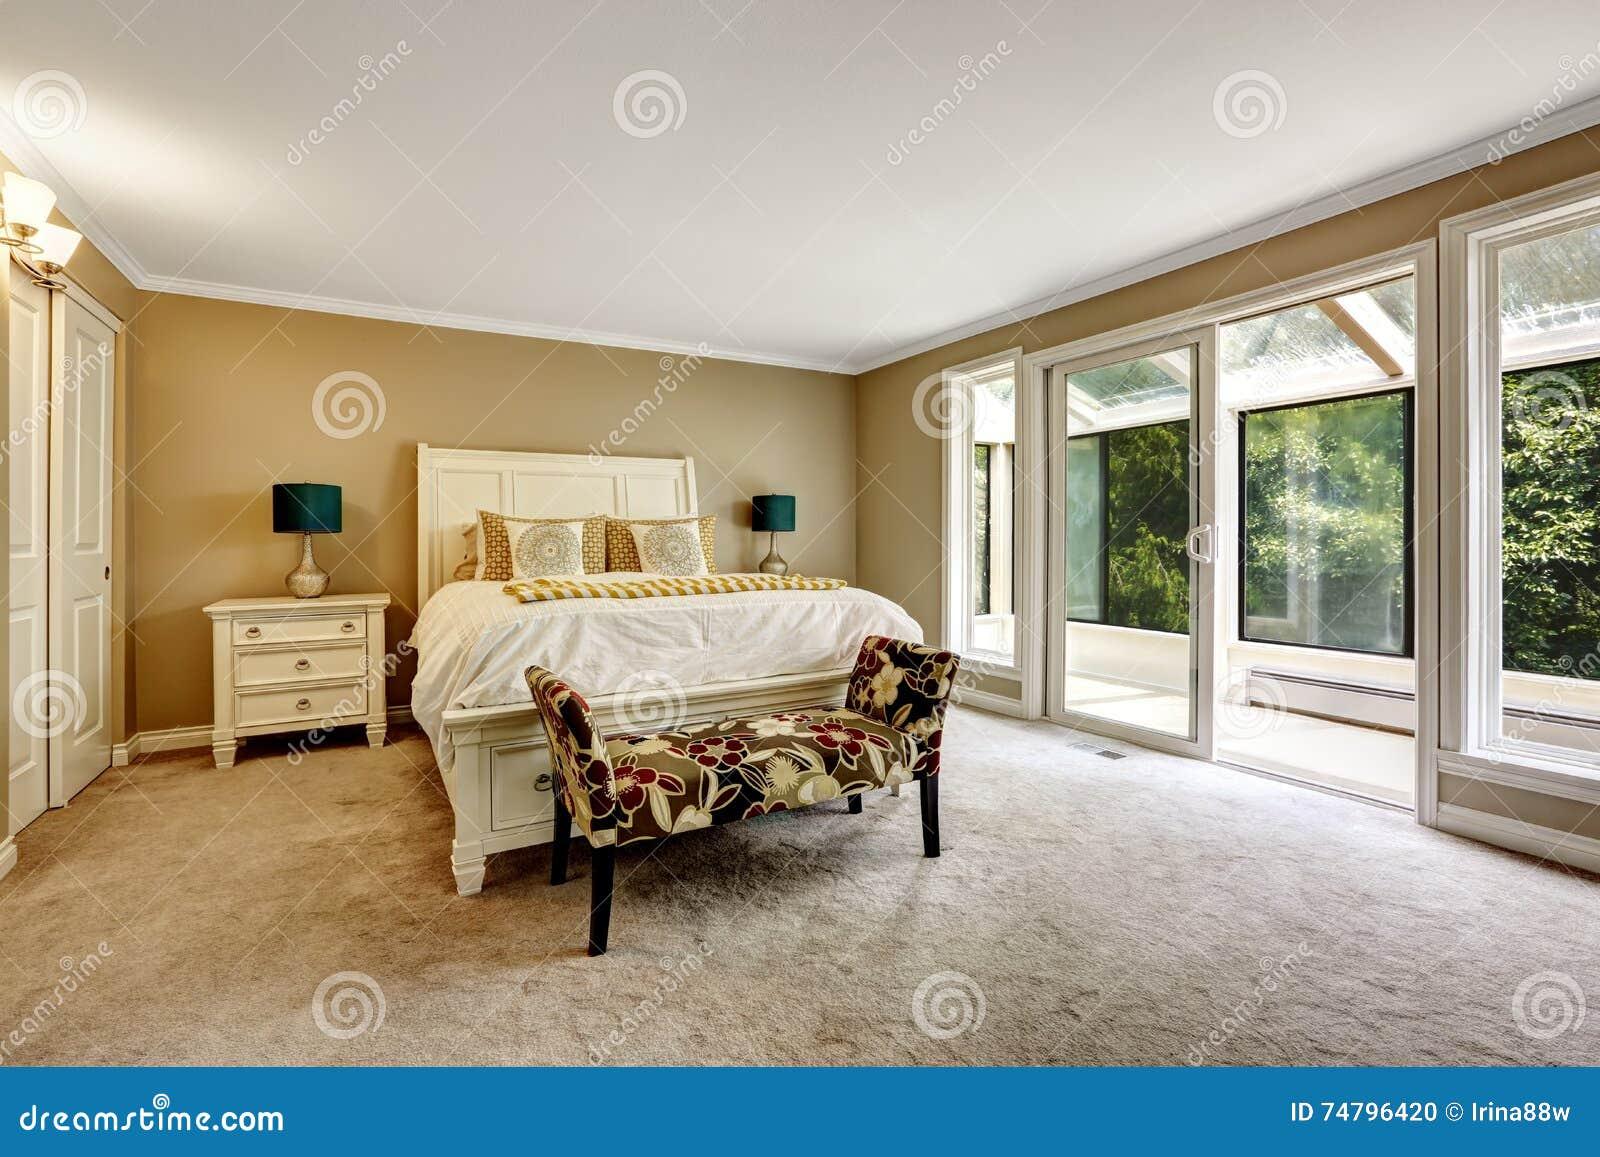 Quarto principal no estilo americano com cama de casal - Tinta camera da letto ...